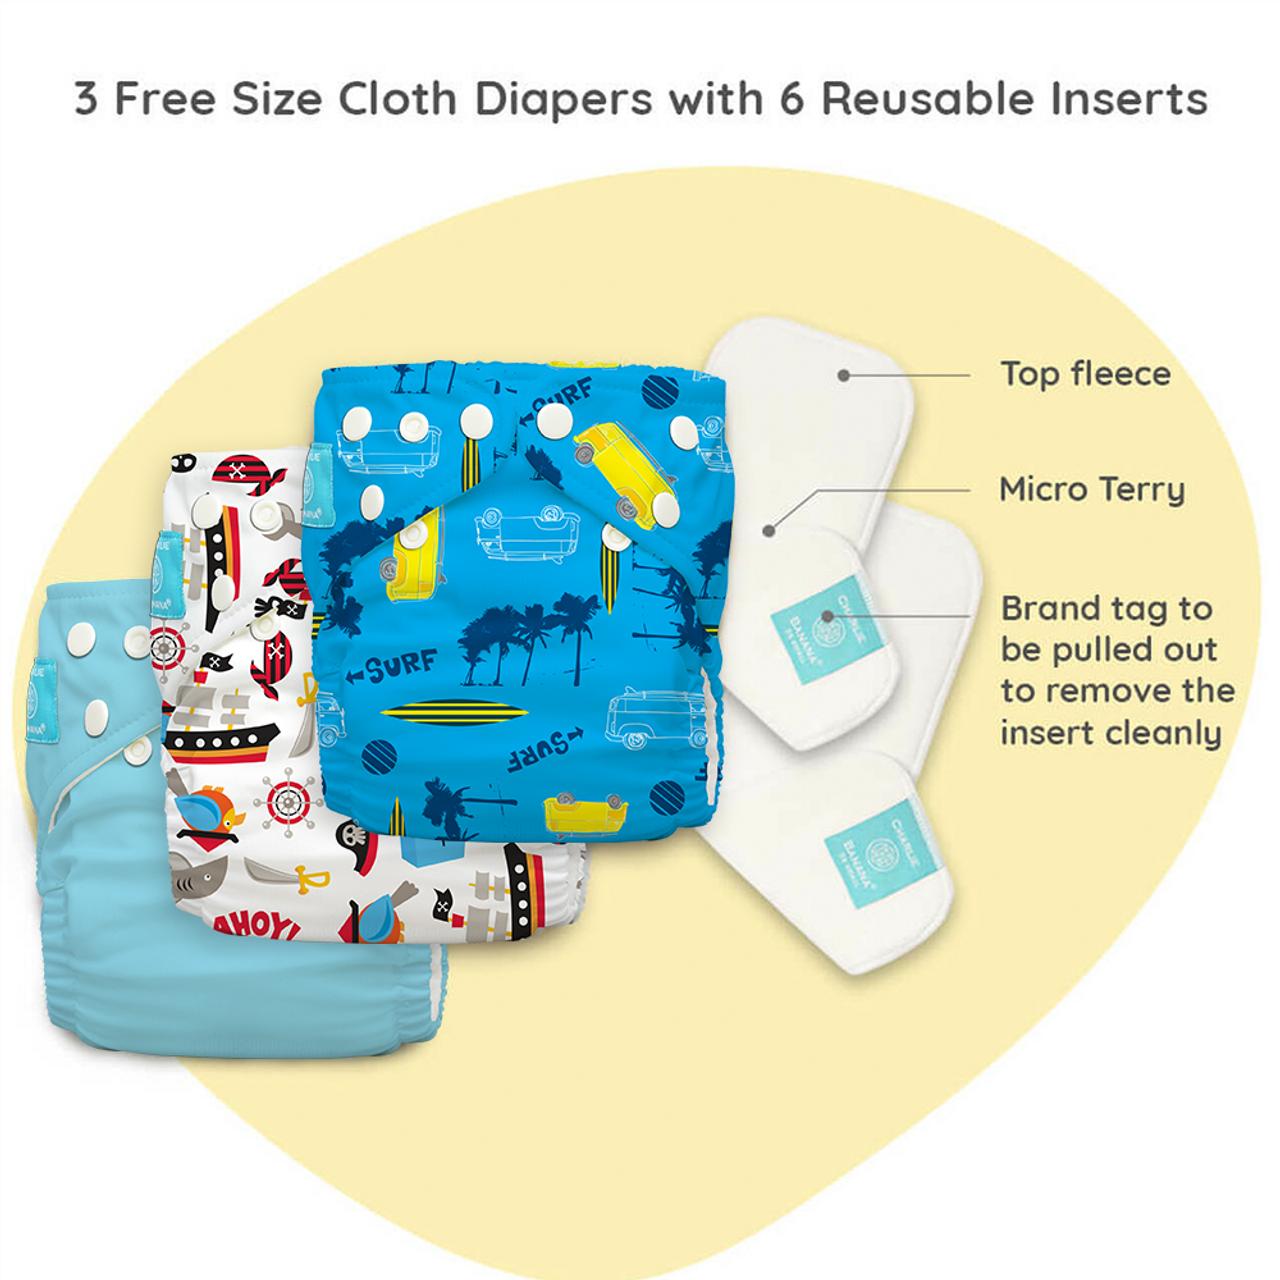 Free Size Cloth Diaper - Super Saver Pack of 3 - Oceana New